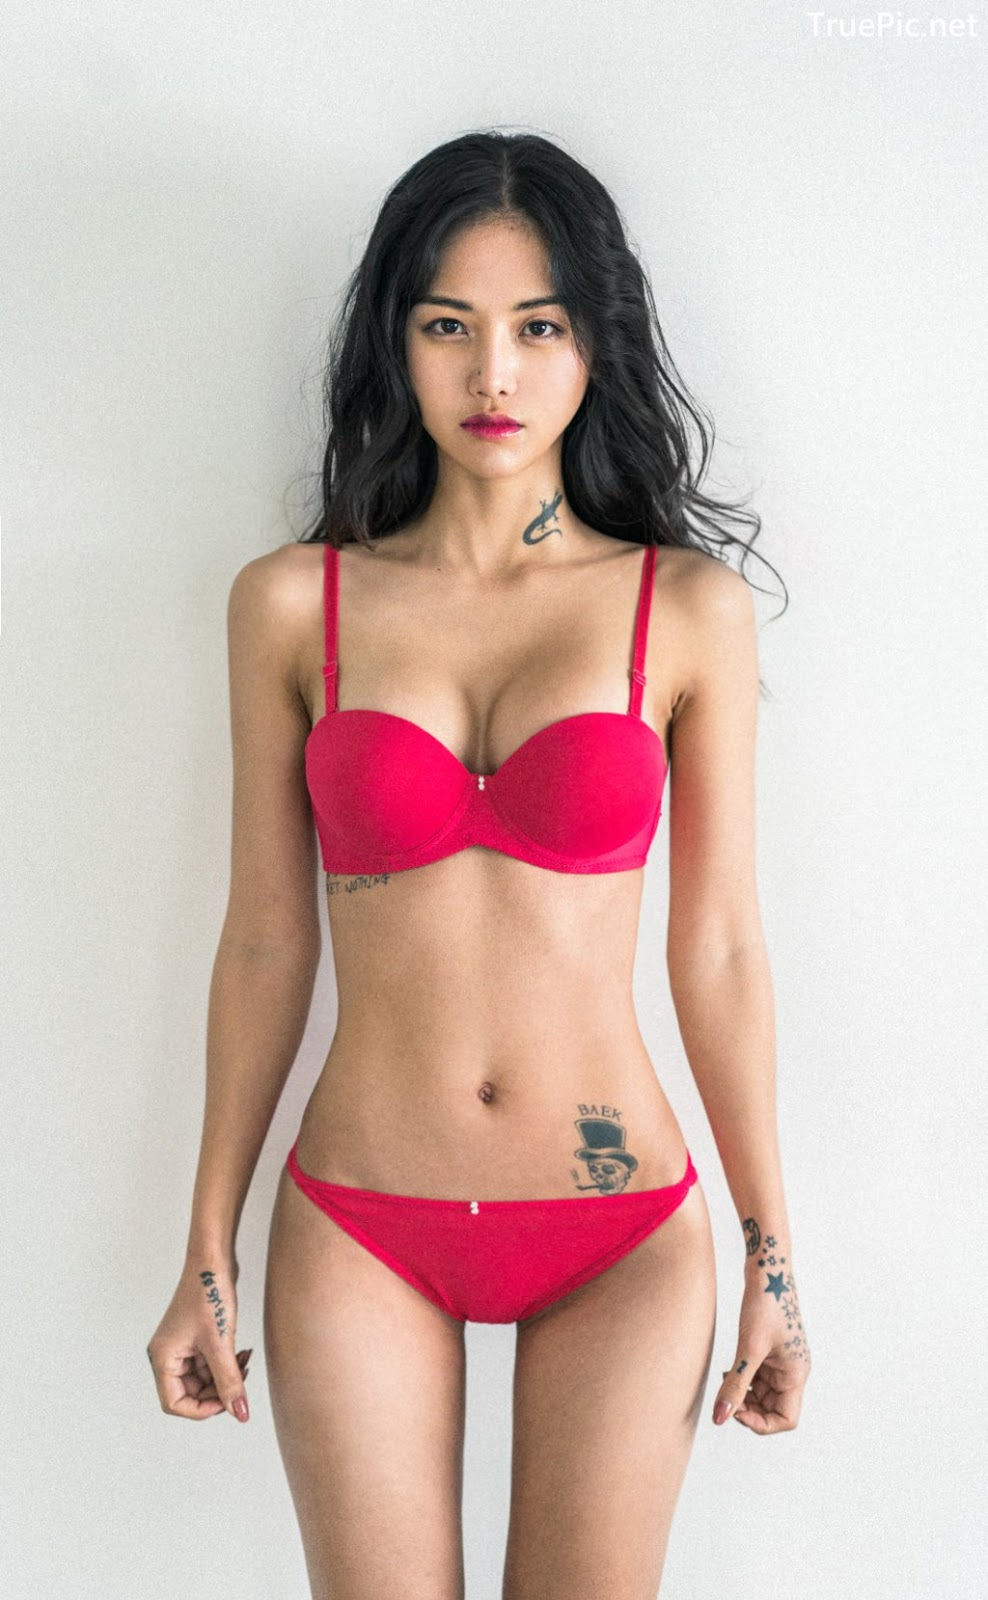 Image Korean Fashion Model – Baek Ye Jin – Sexy Lingerie Collection #3 - TruePic.net - Picture-1